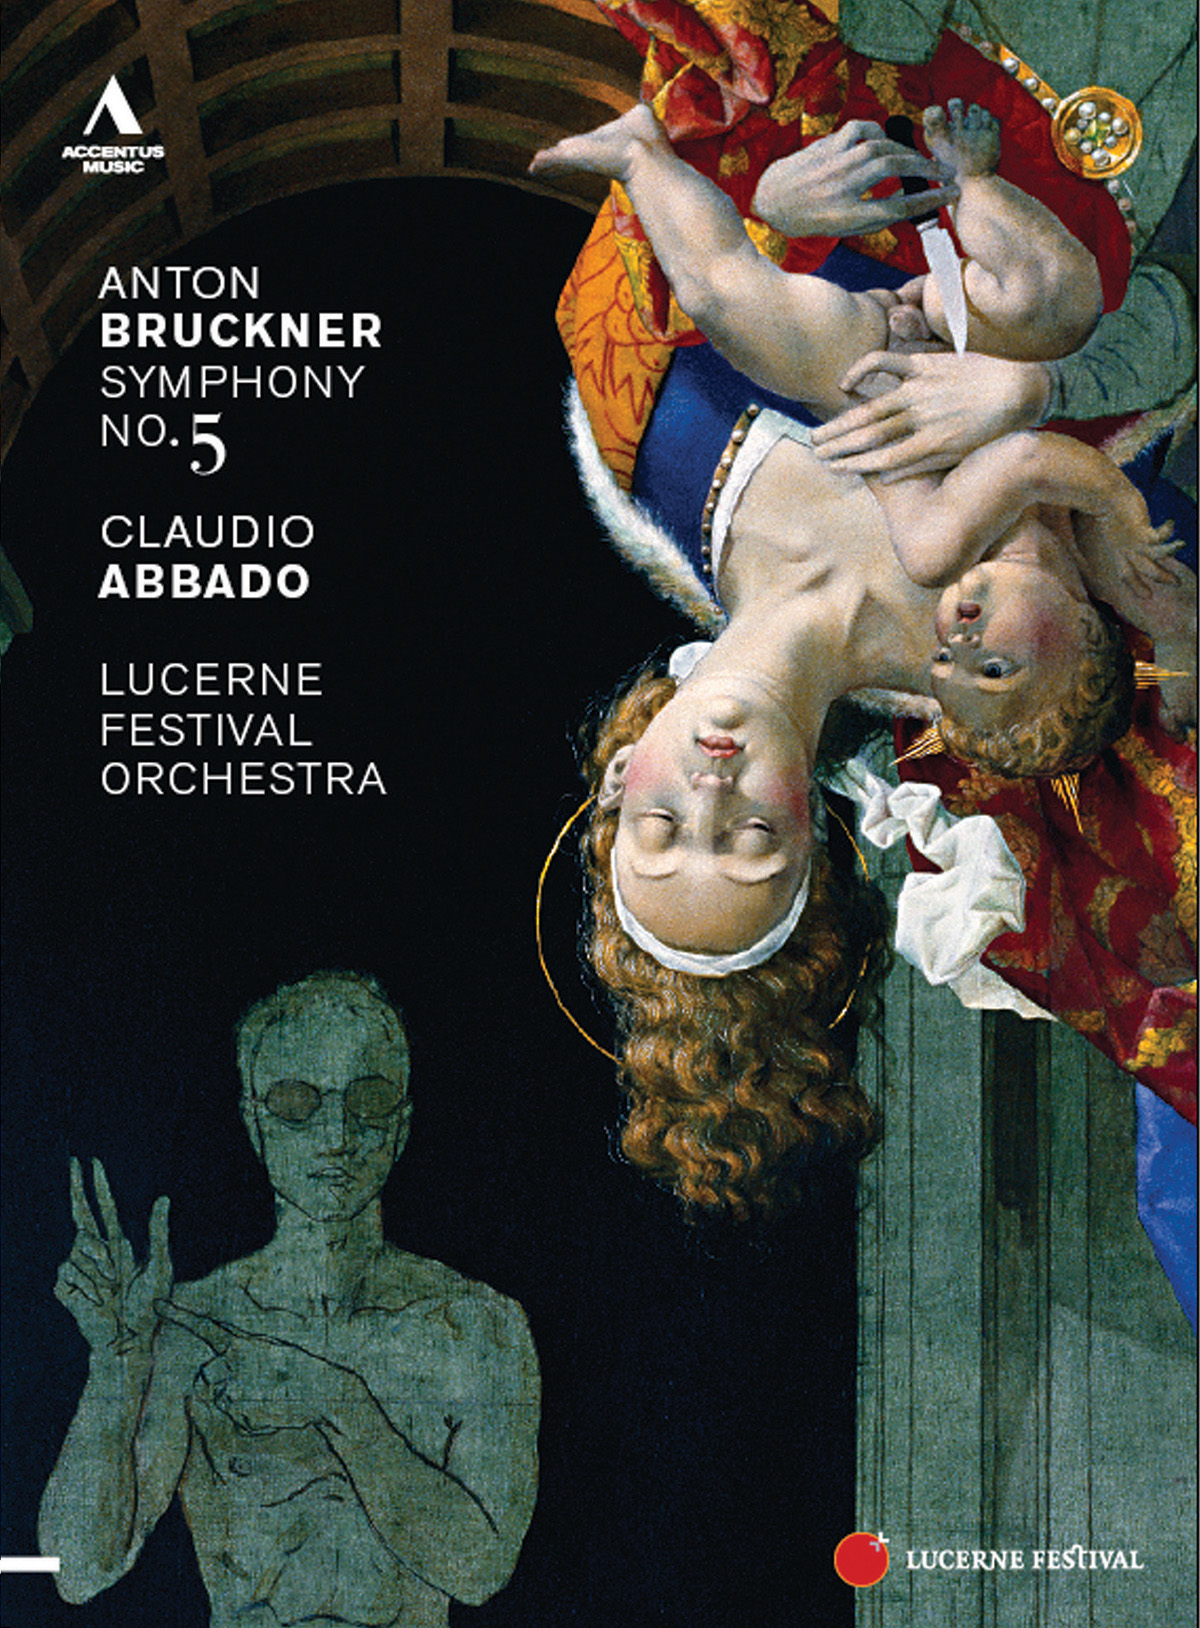 Claudio Abbado/Lucerne Festival Orchestra: Anton Bruckner - Symphony No. 5